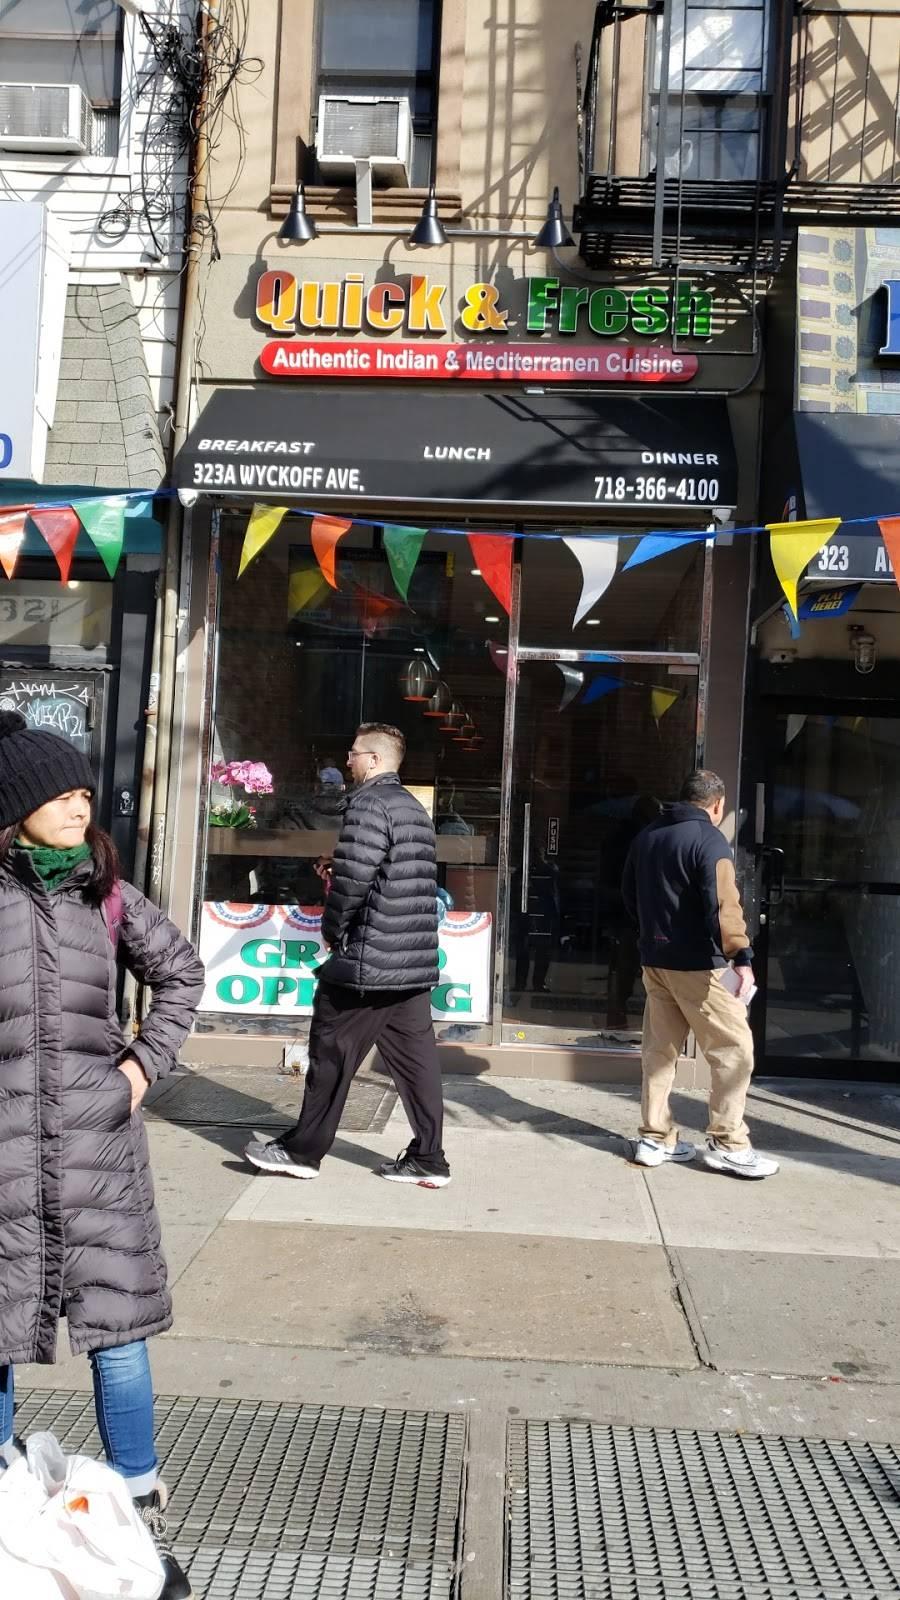 Quick N Fresh | restaurant | 323A Wyckoff Ave, Ridgewood, NY 11385, USA | 7183664100 OR +1 718-366-4100